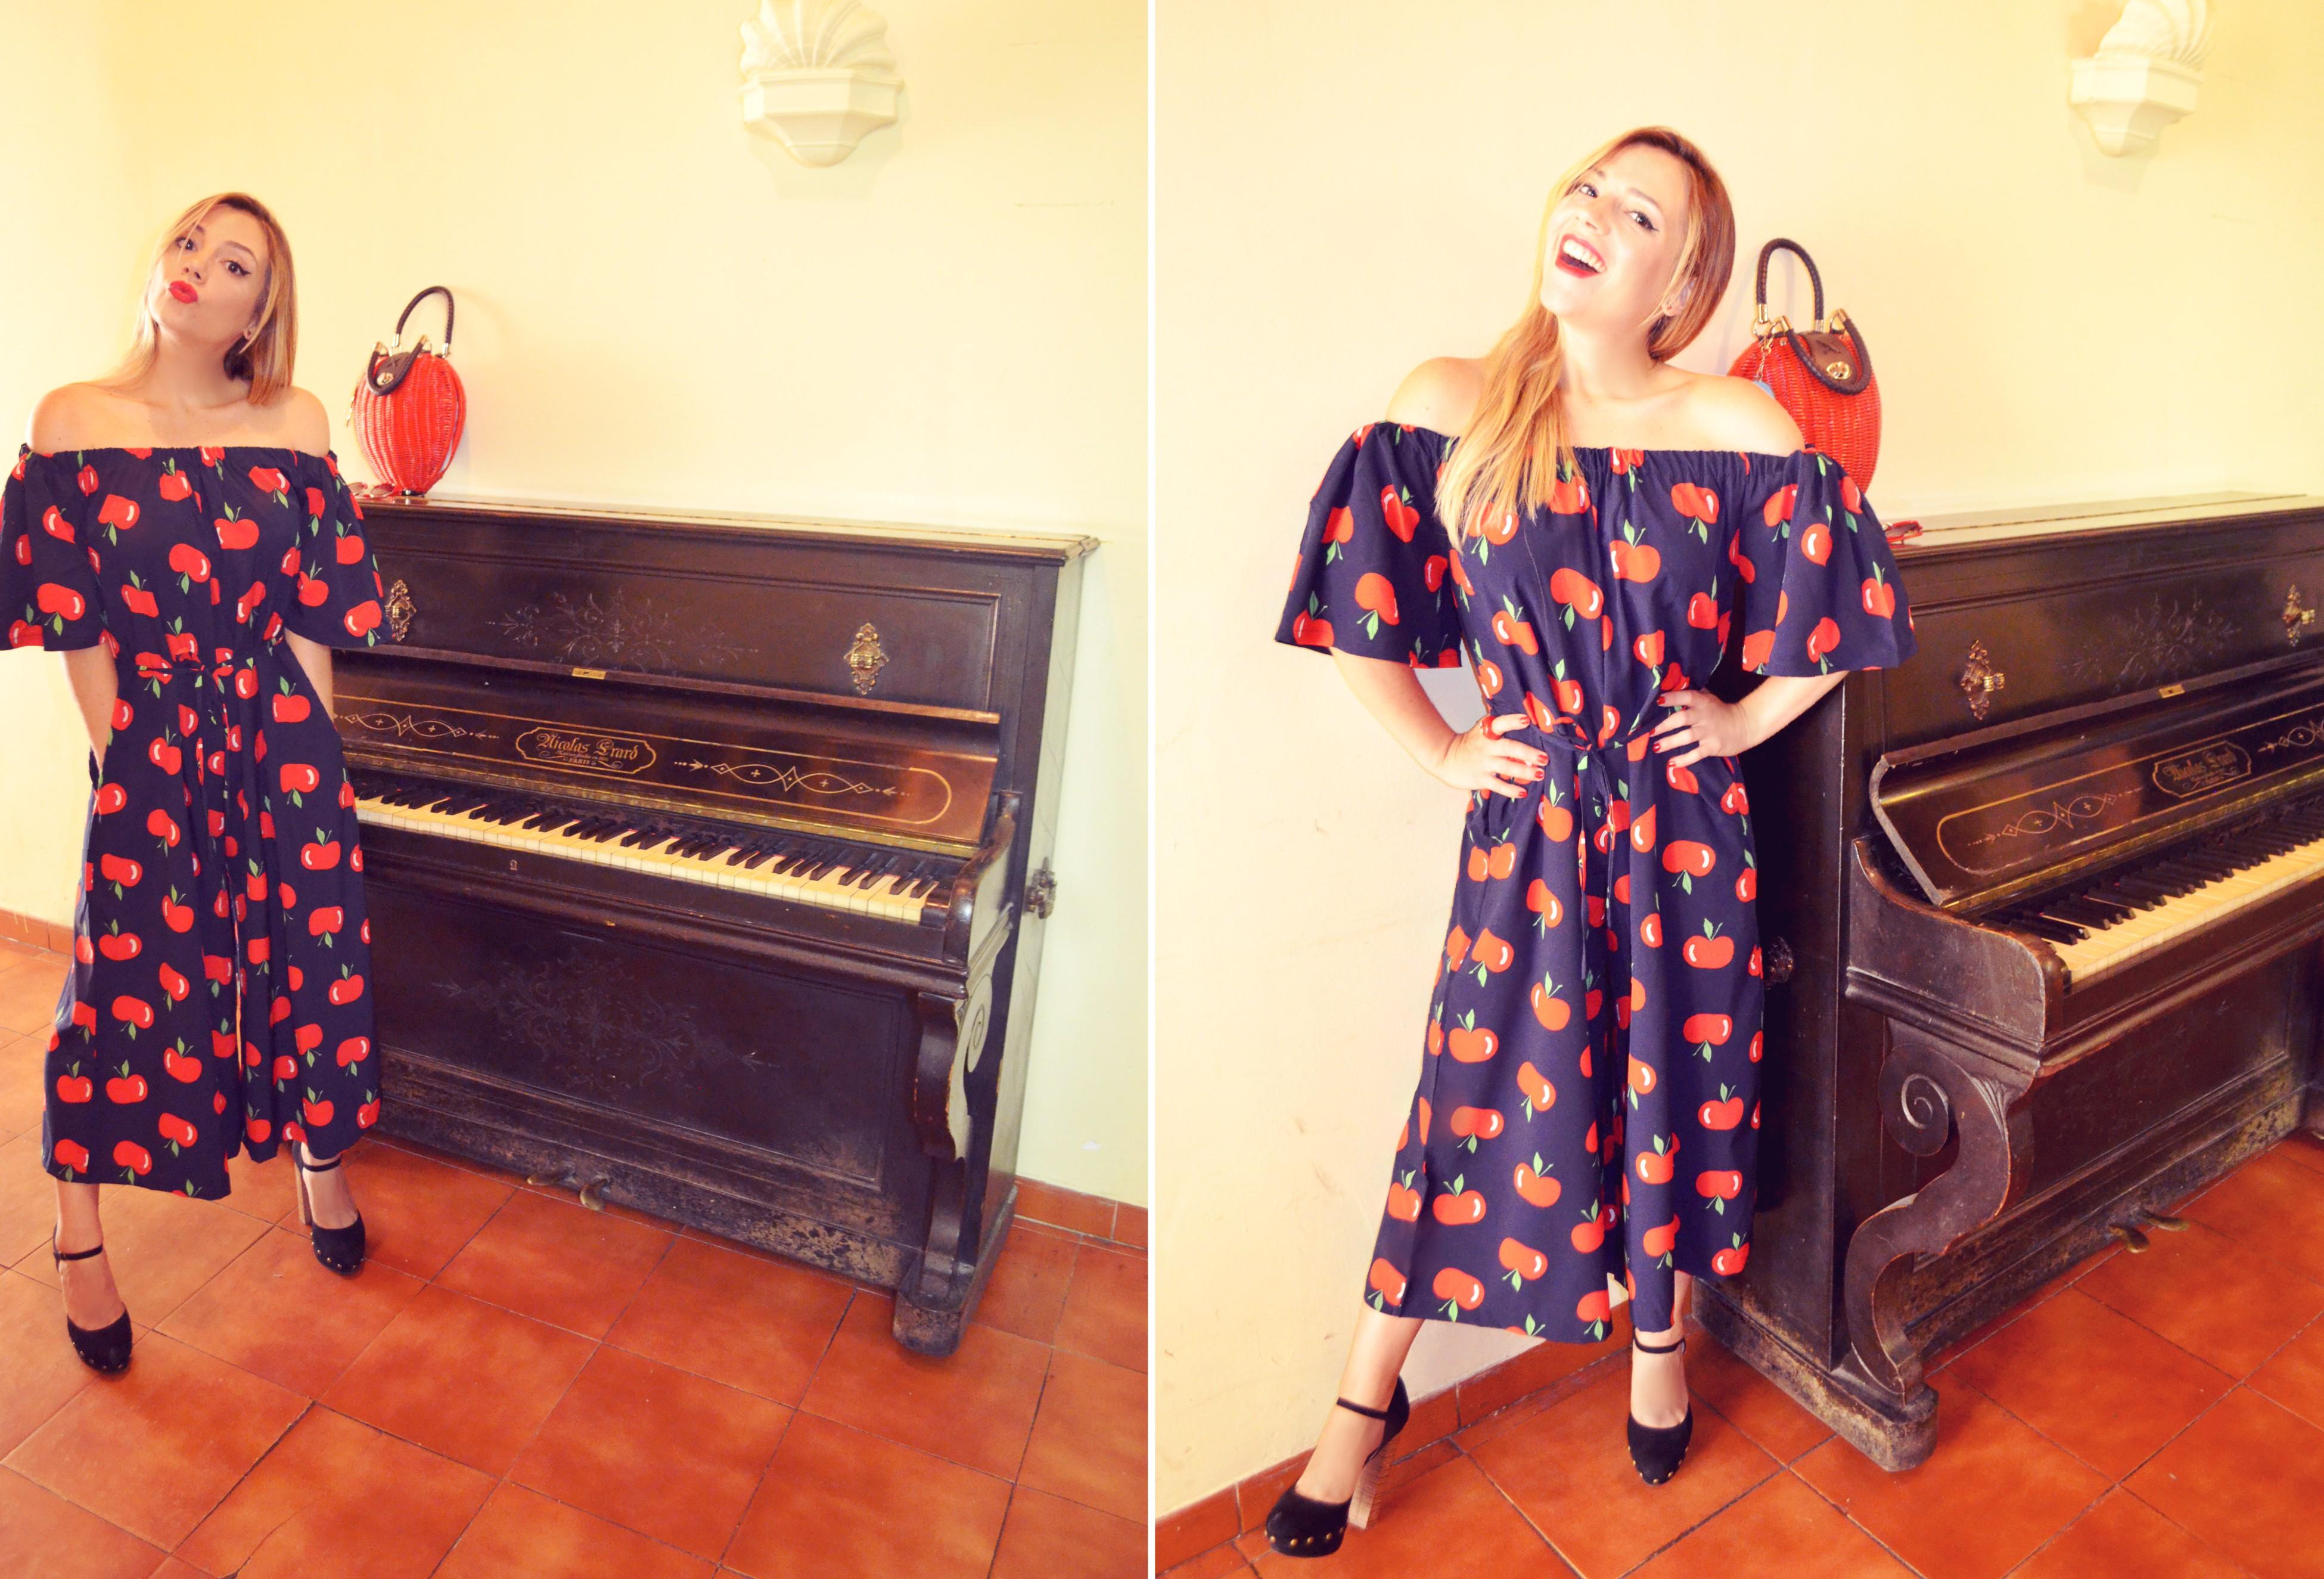 ChicAdicta-mono-smile-Chic-Adicta-blog-de-moda-fashionista-summer-jumpsuit-fancy-look-retro-style-influencer-PiensaenChic-Piensa-en-Chic